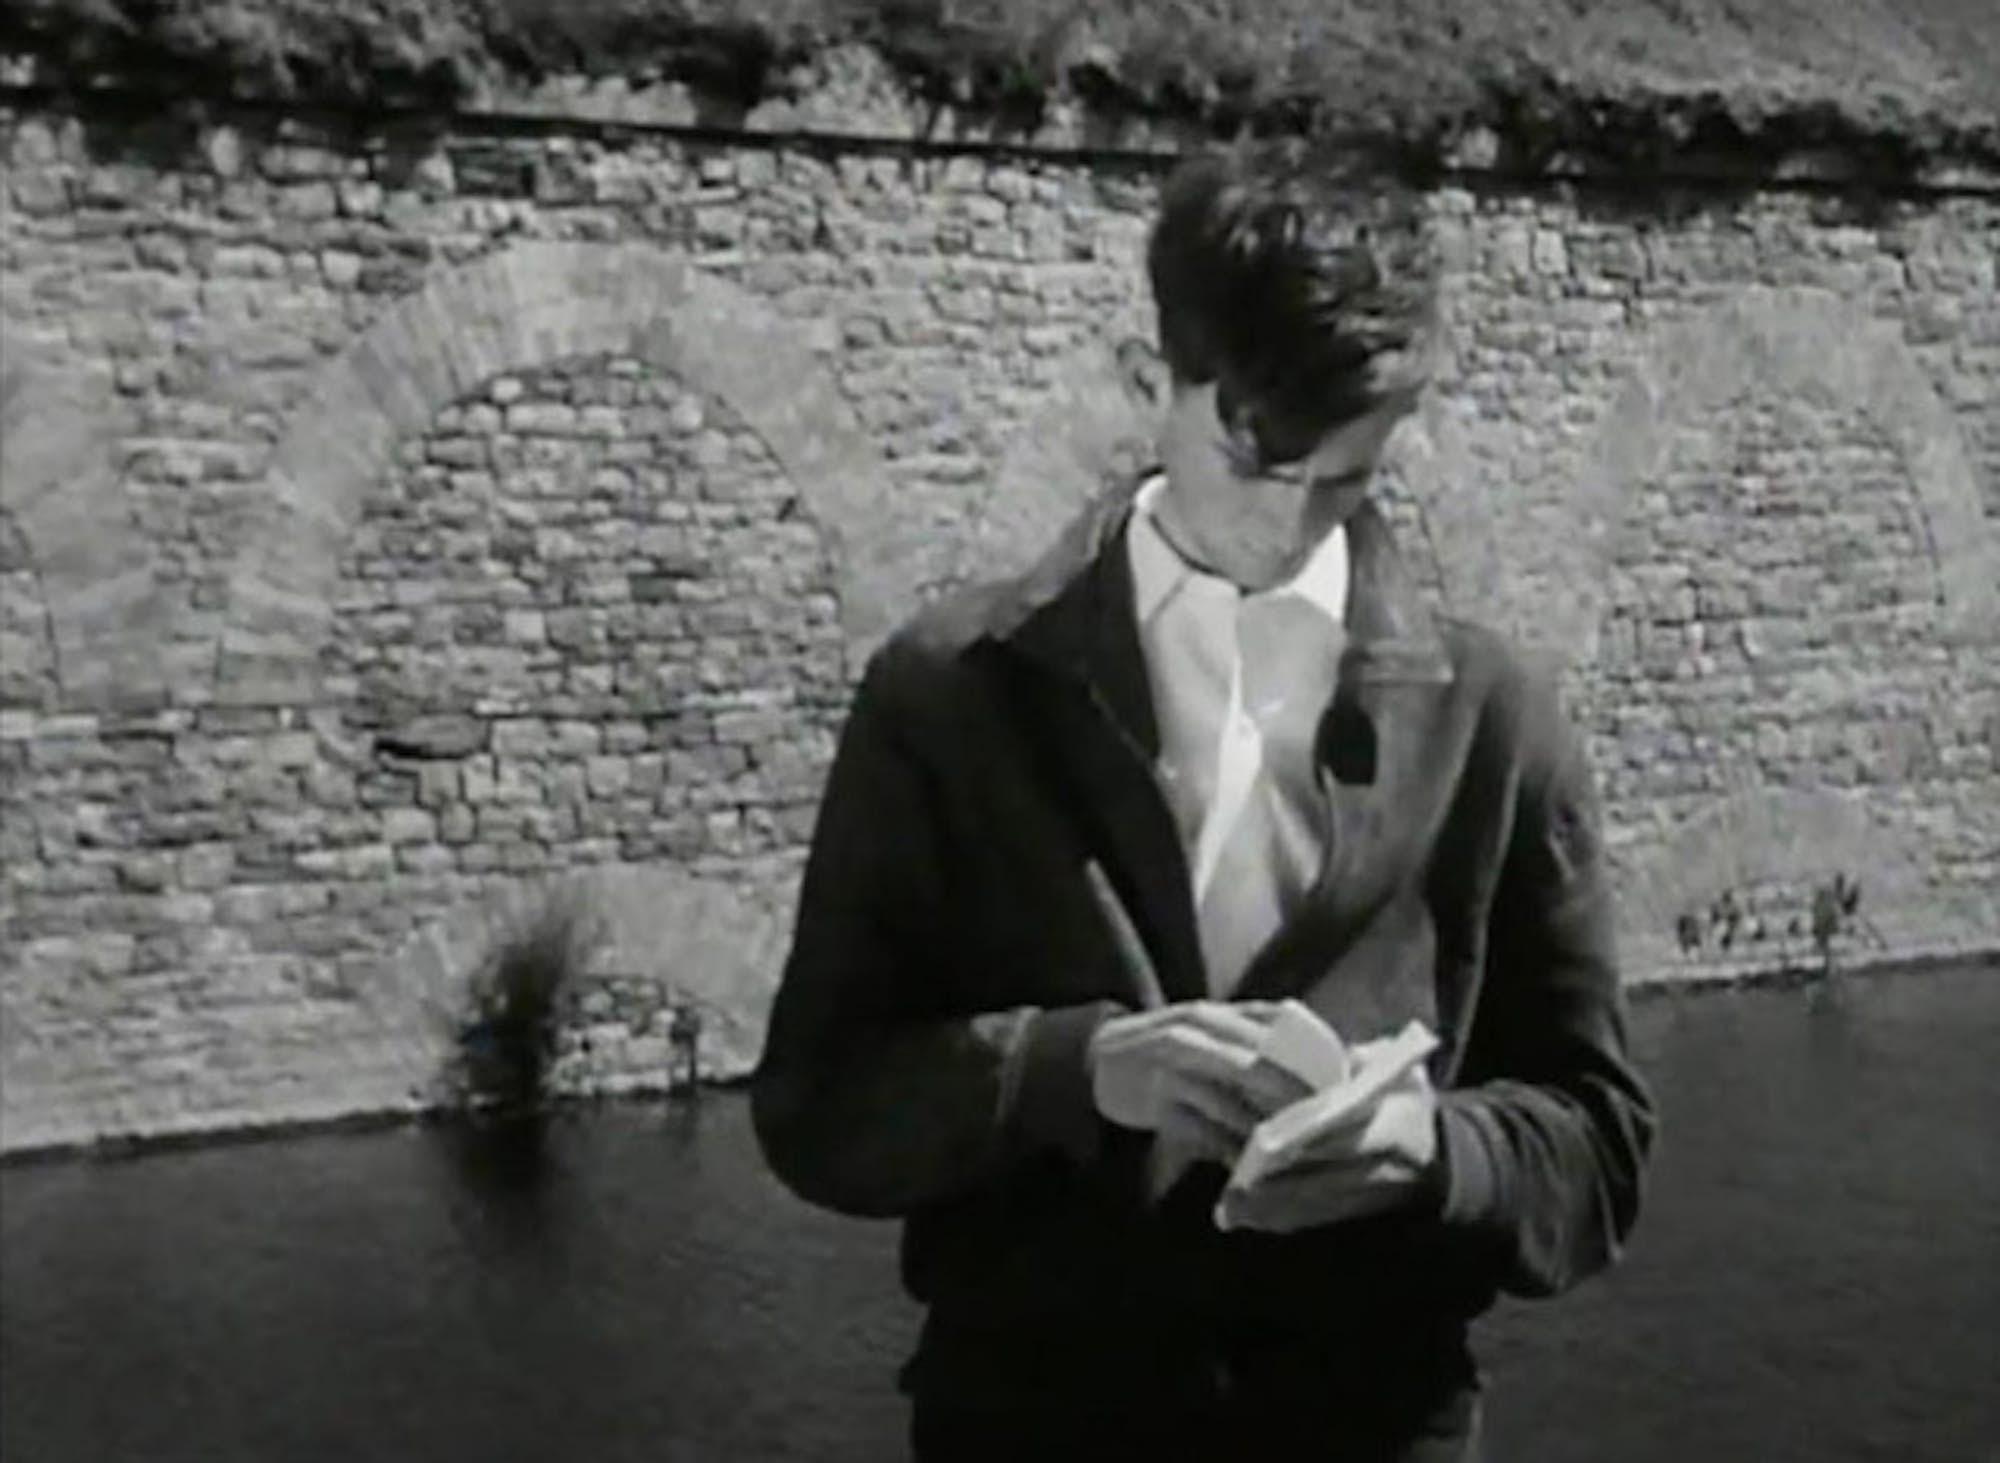 Marcel MARIEN Imitation du cinéma 3